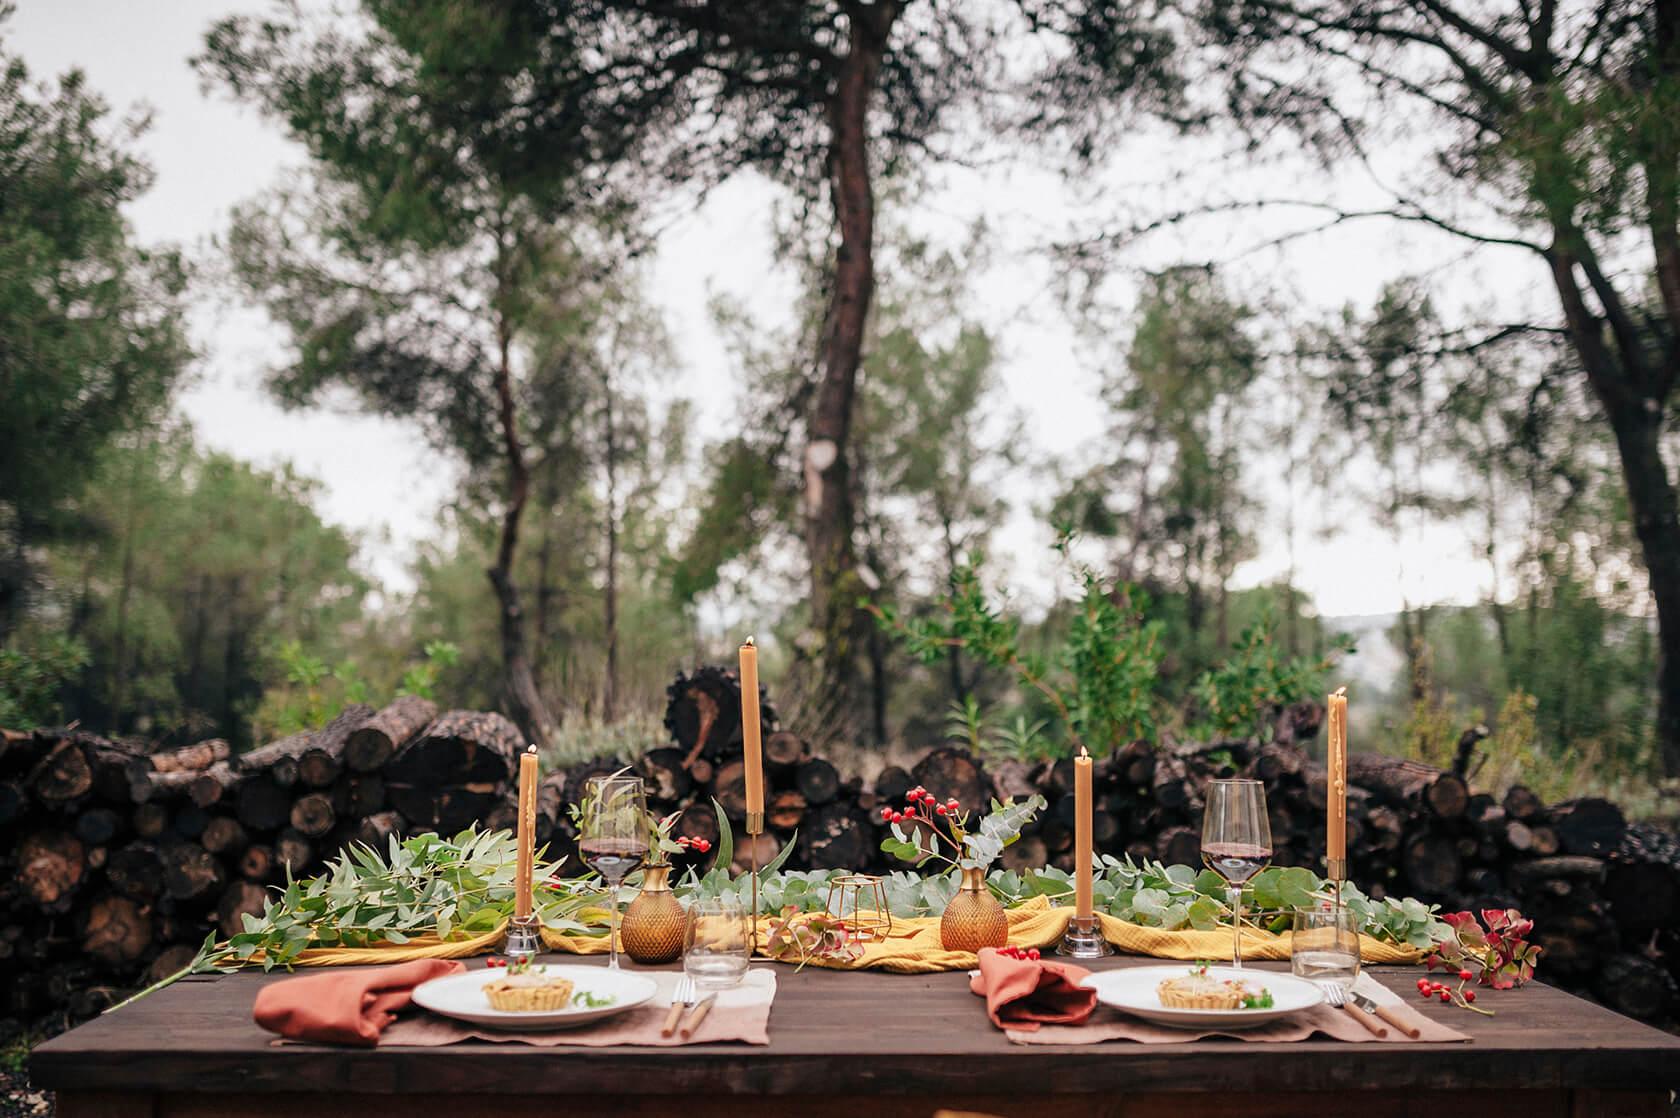 wedding photoshoot in Spain